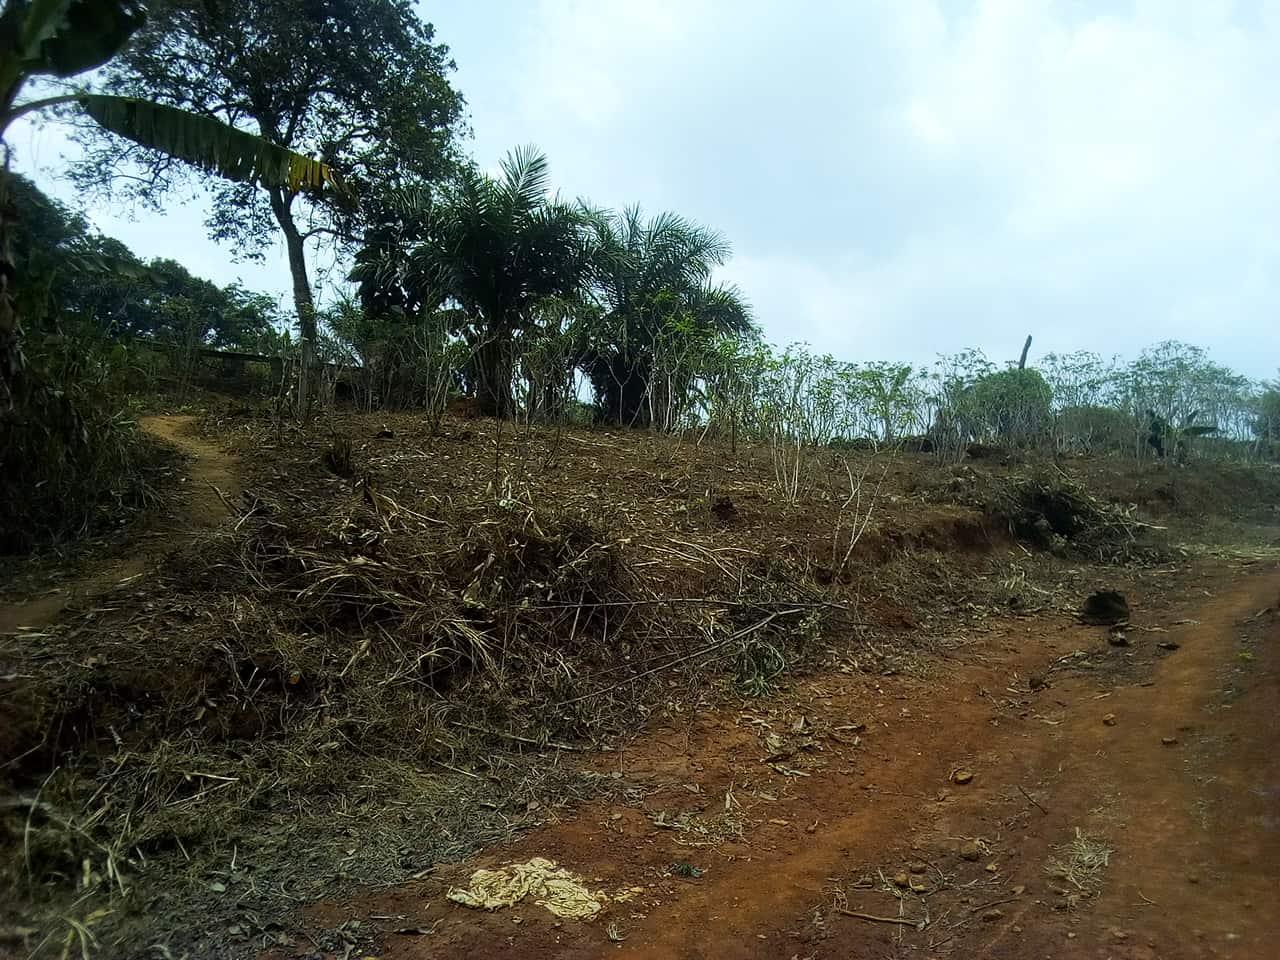 Land for sale at Yaoundé, Nkolondom, carrefour theo - 1000 m2 - 30 000 000 FCFA